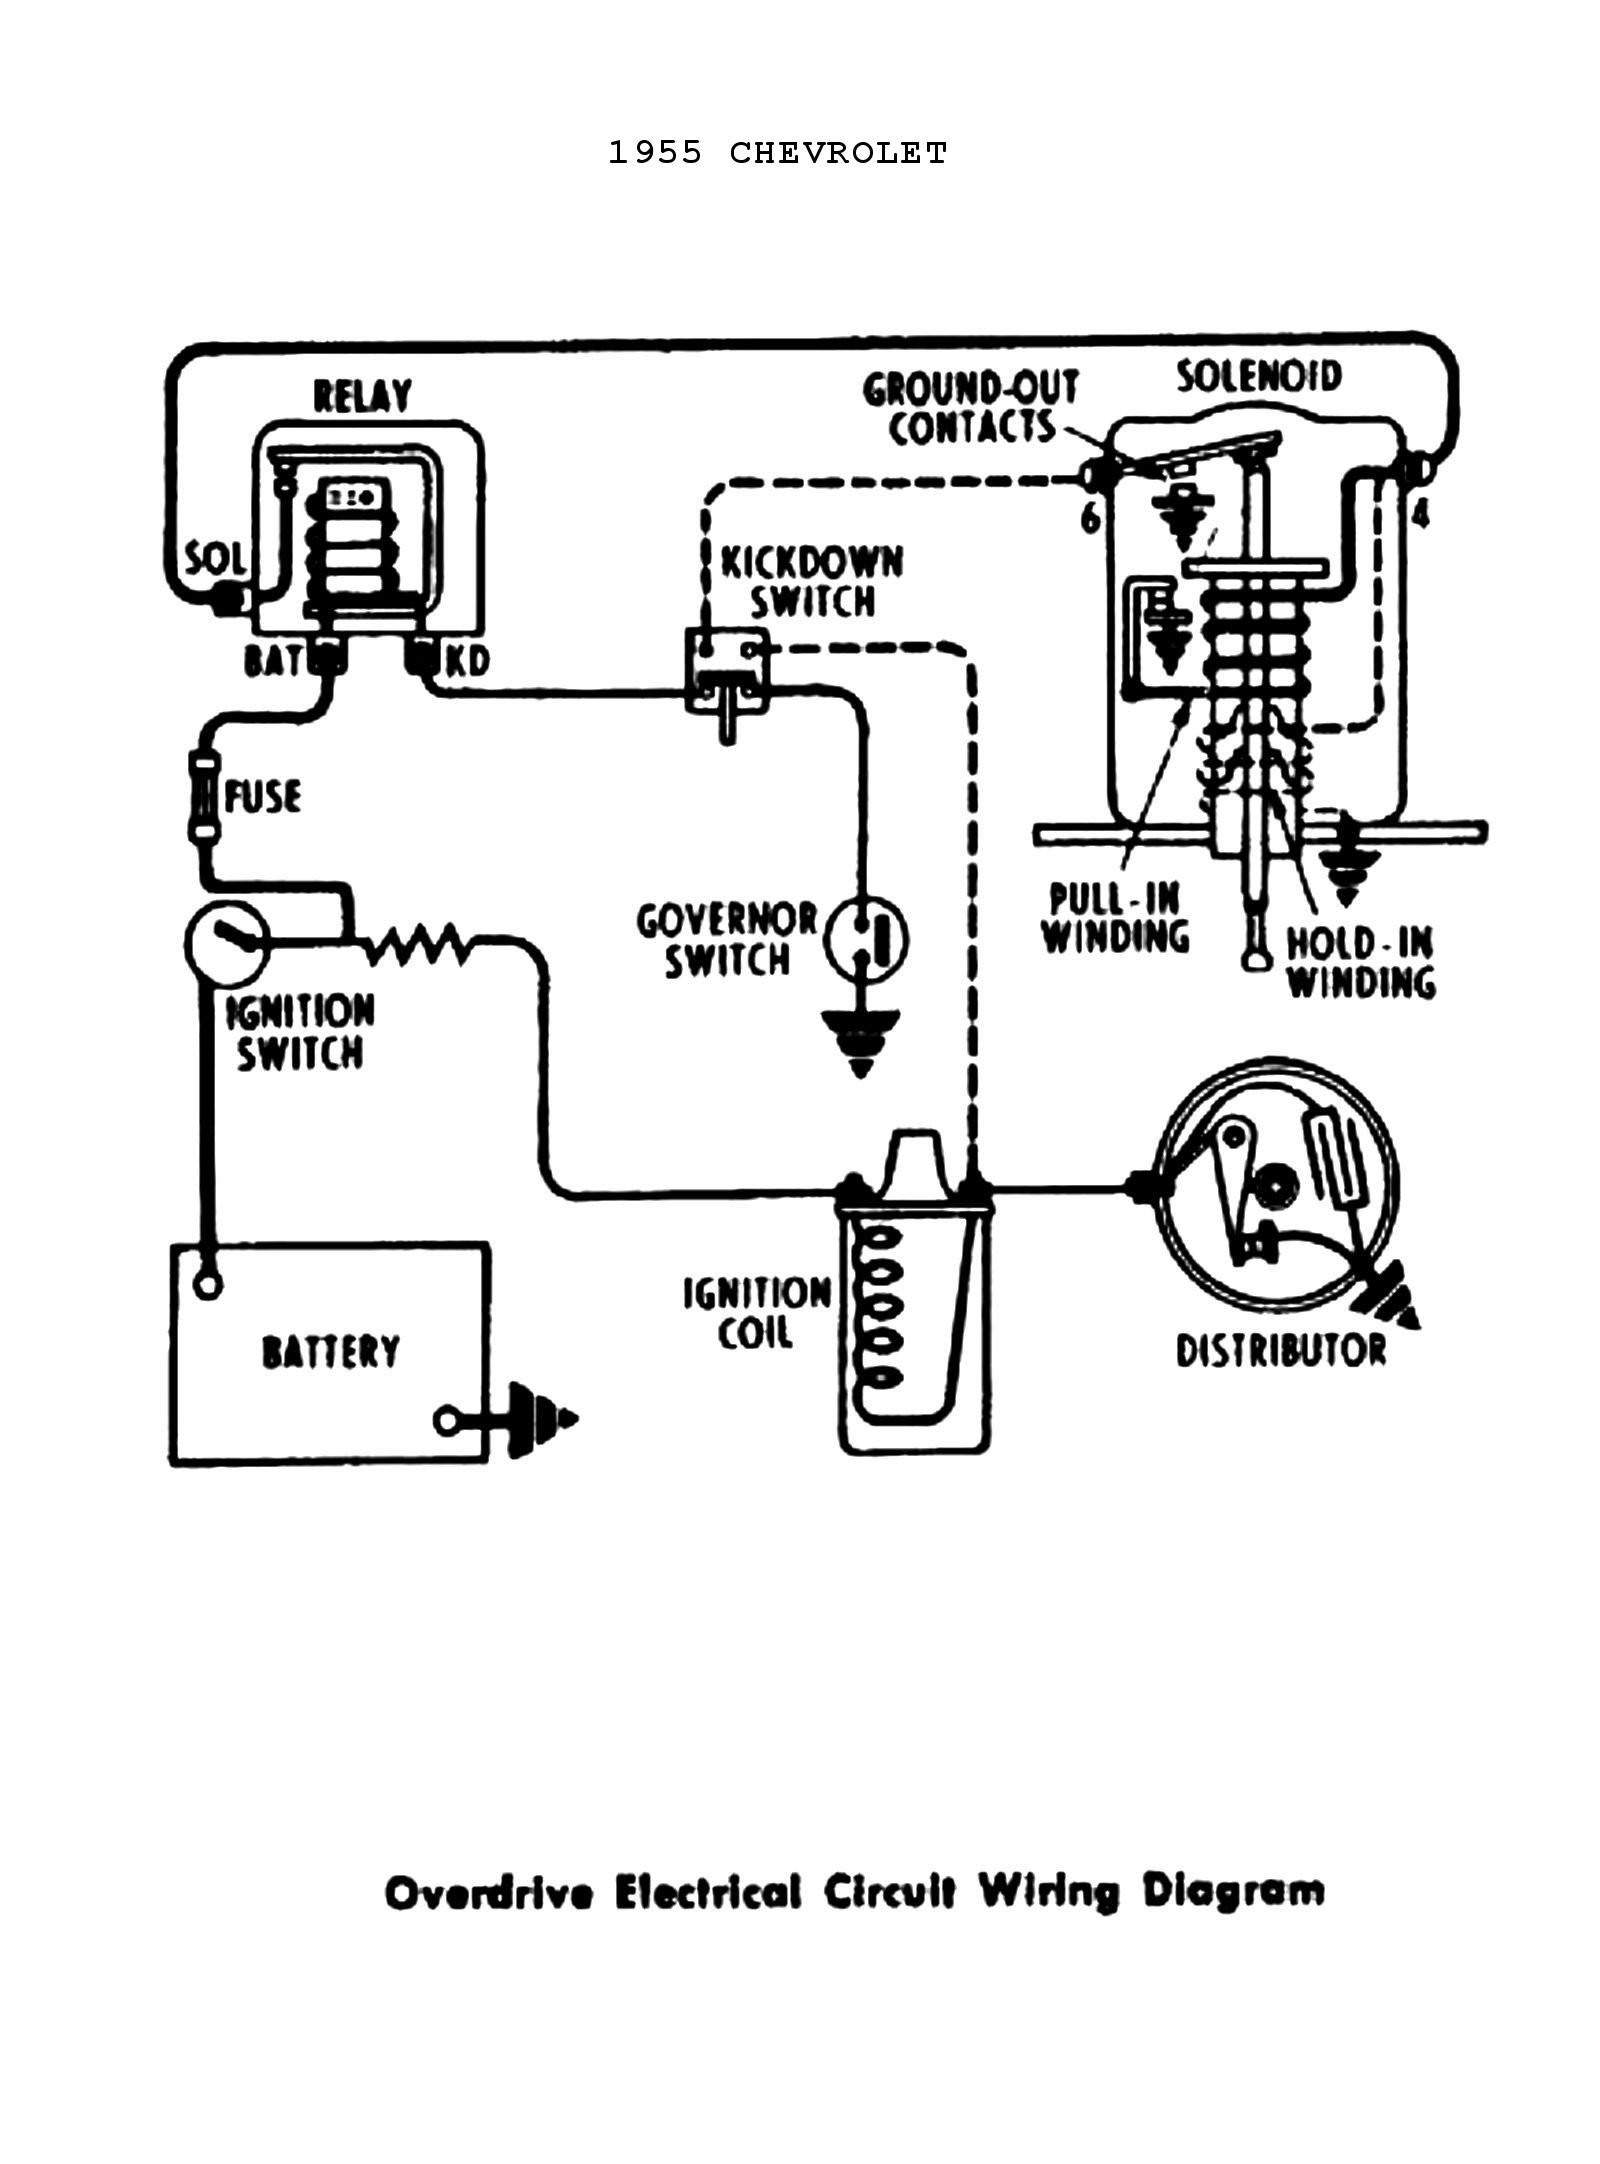 1955 Power Windows & Seats · 1955 Overdrive Circuit